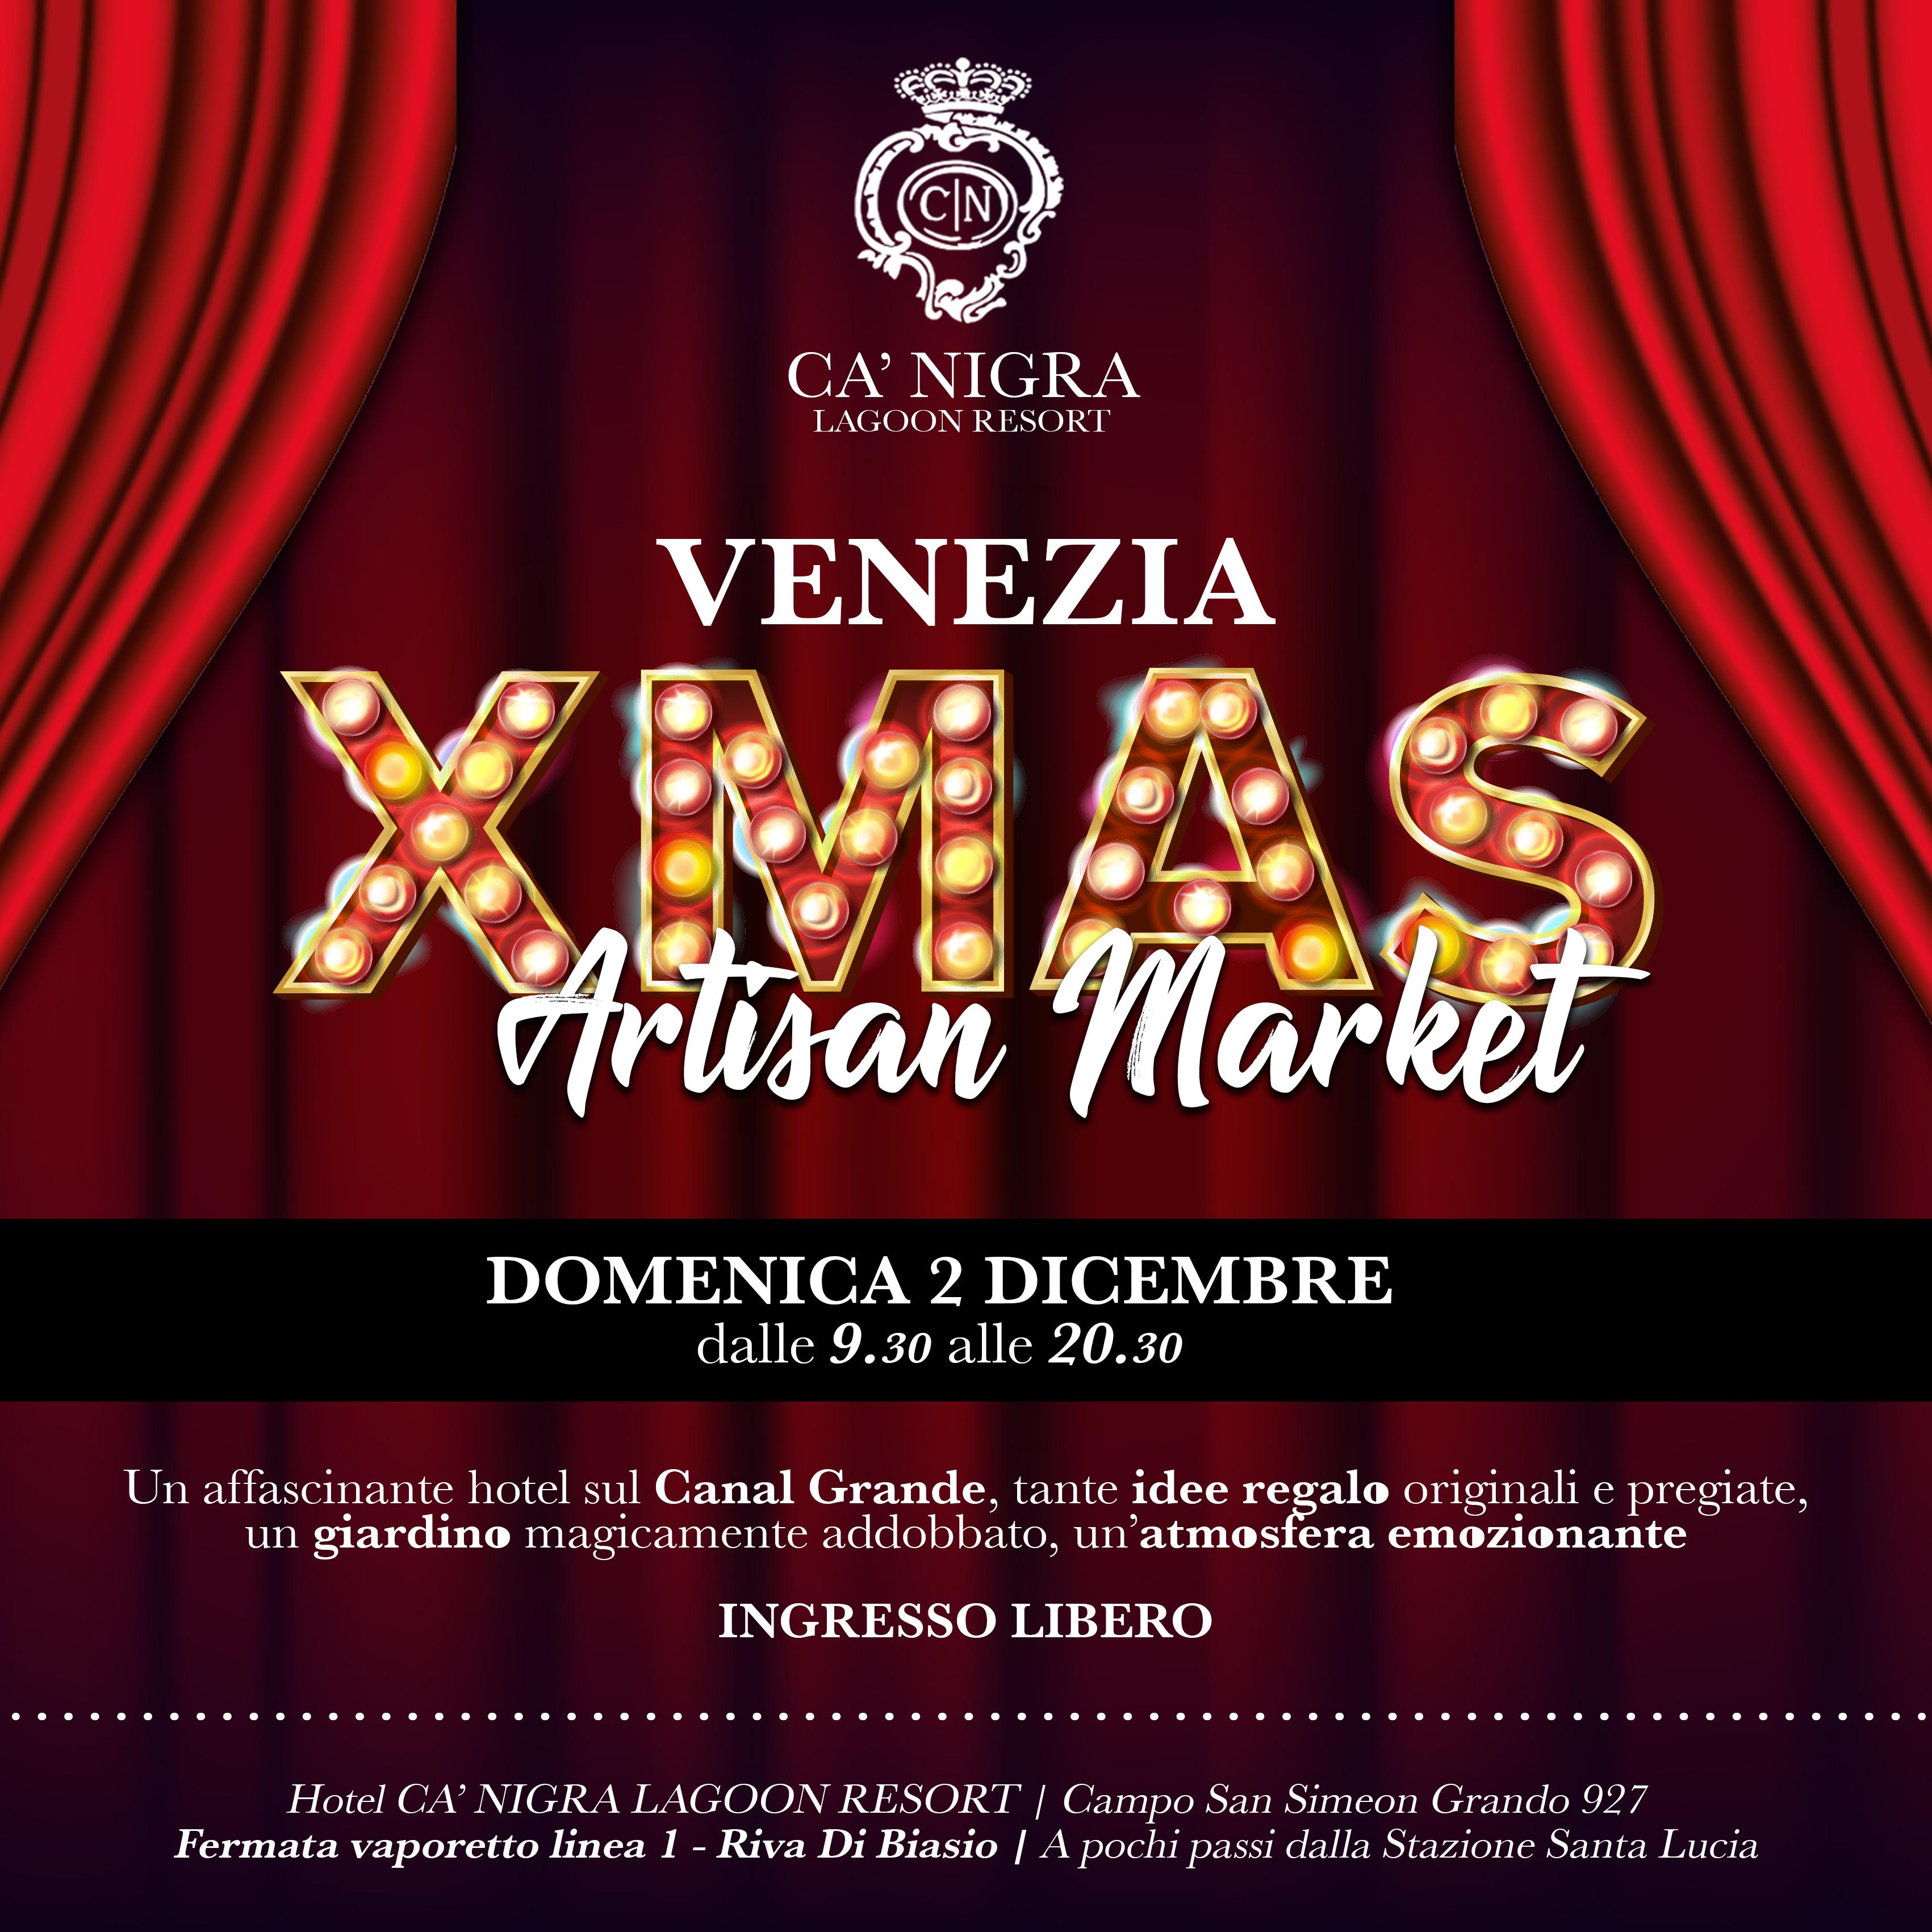 Xmas-Artisan-Market-Venezia